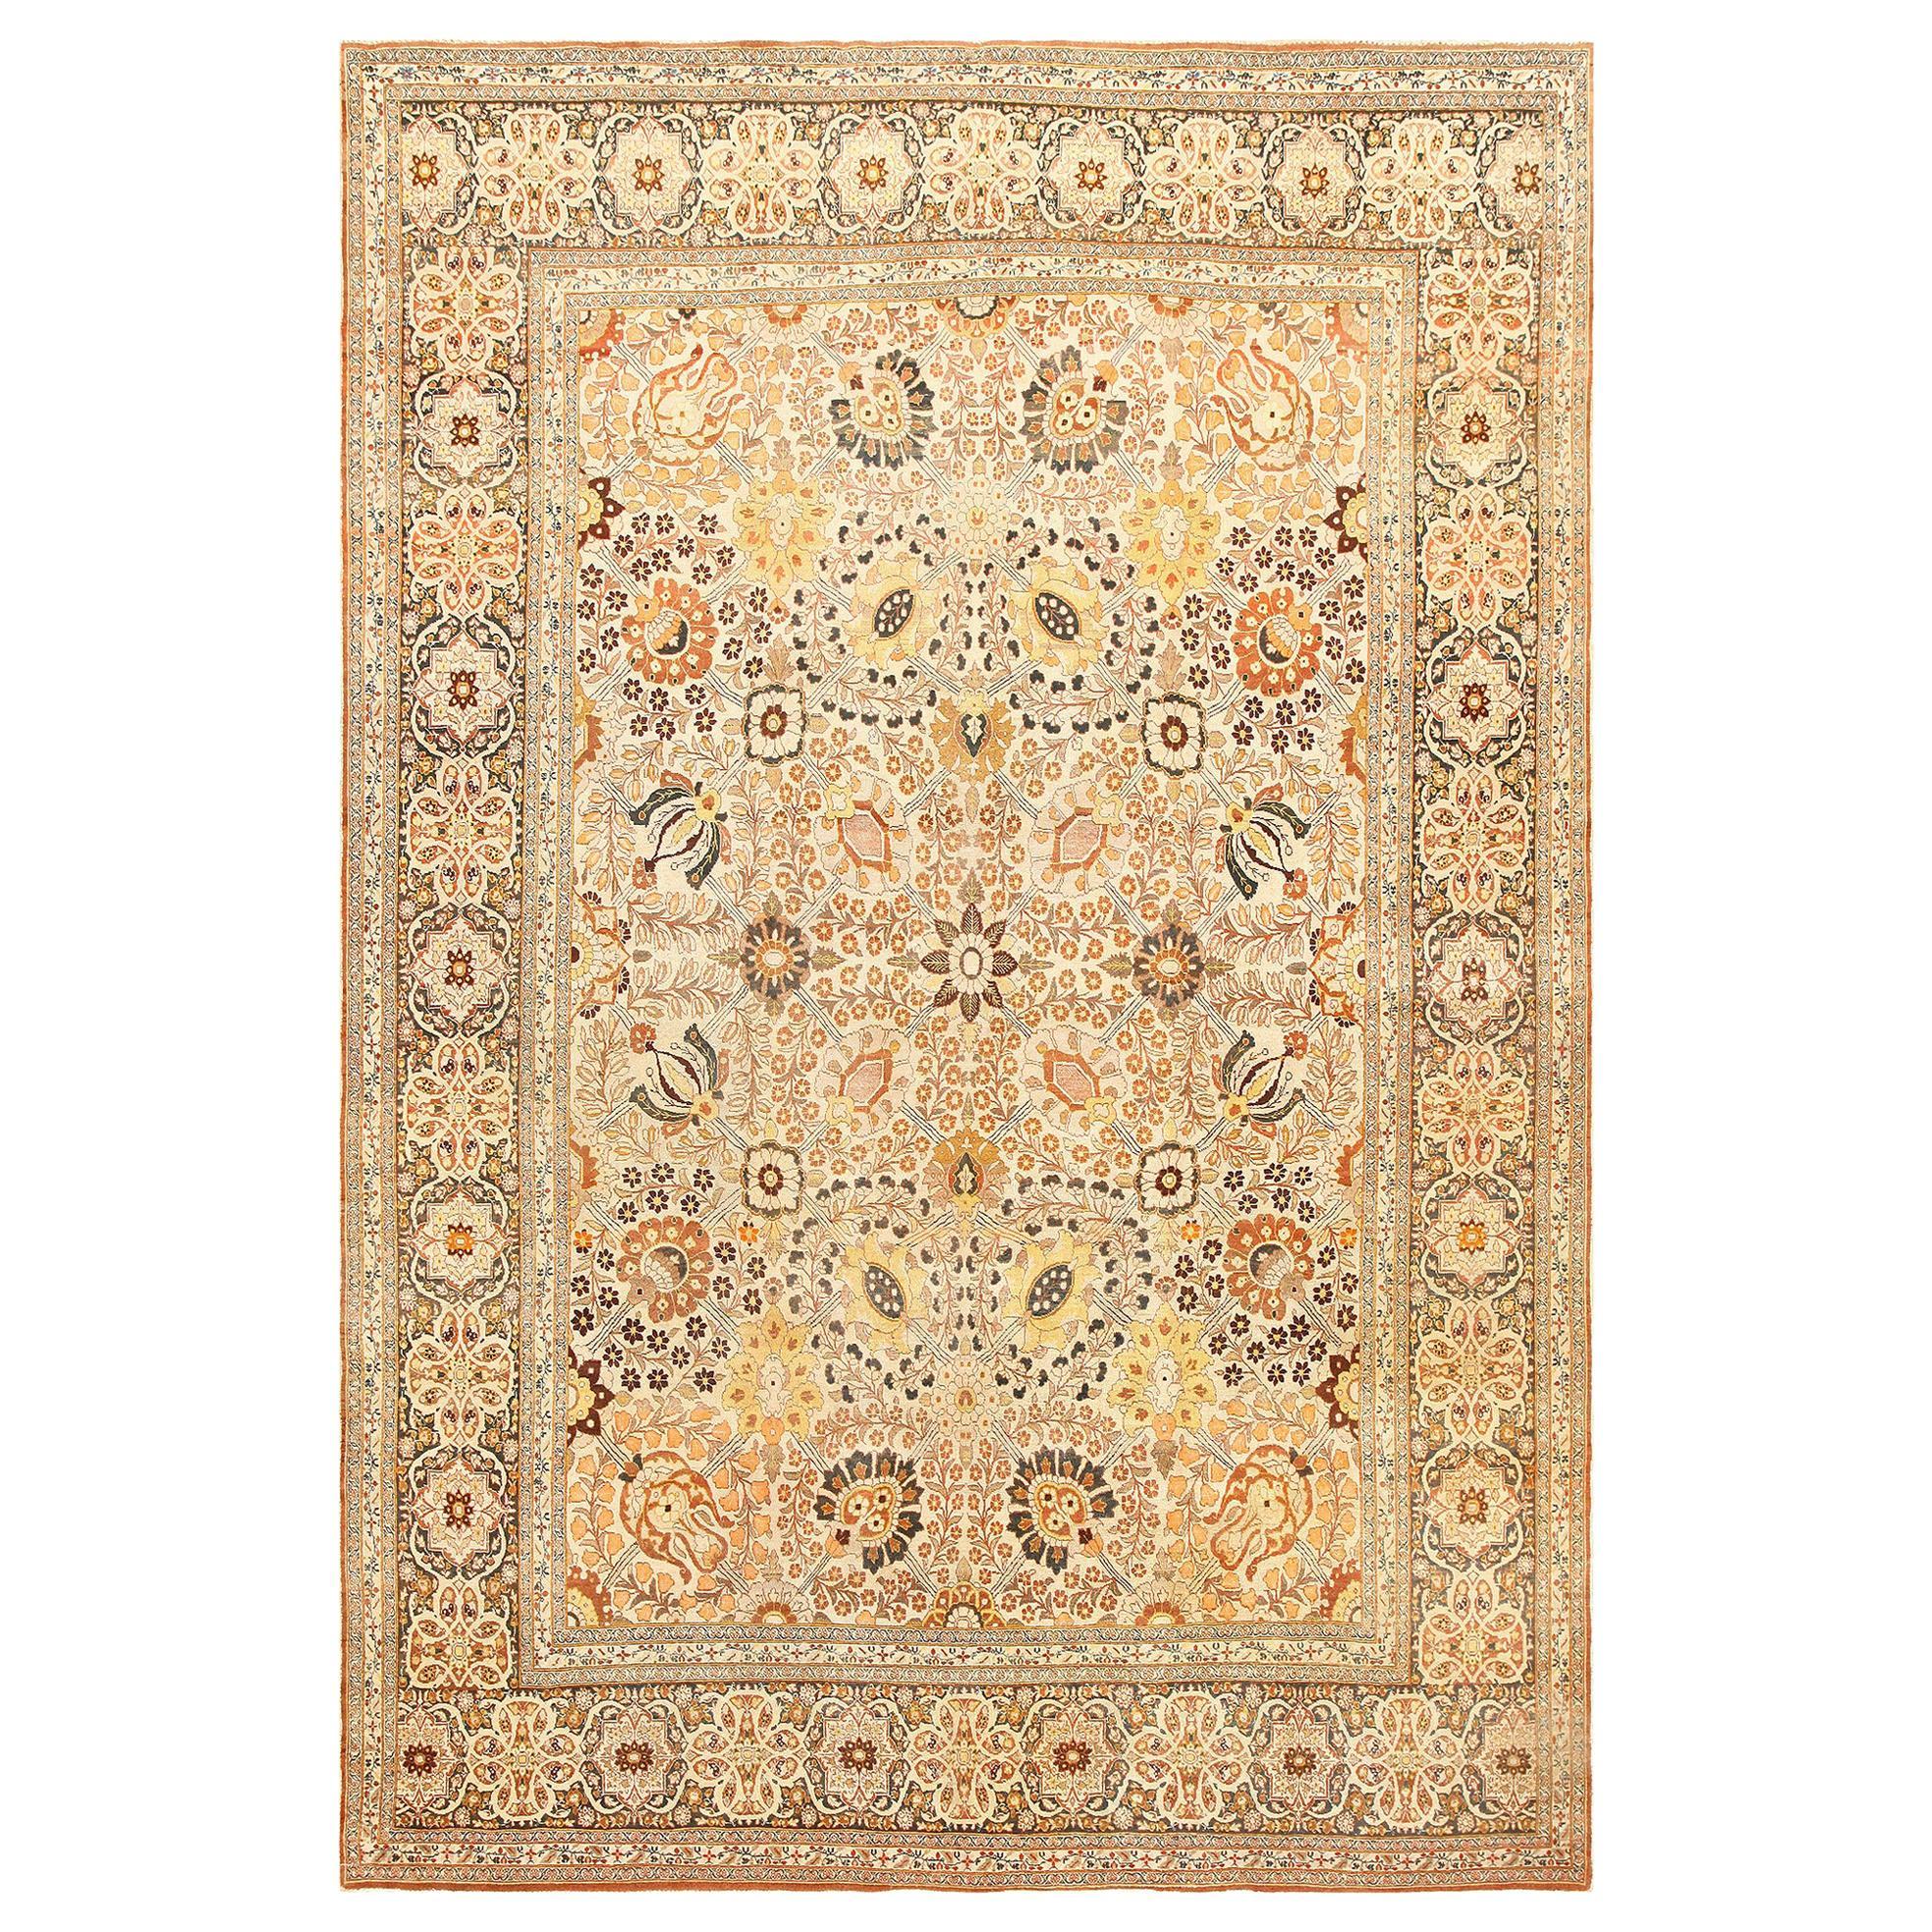 "Fine Room Size Antique Persian Haji Jalili Tabriz Rug. Size: 9' 3"" x 13' 6"""